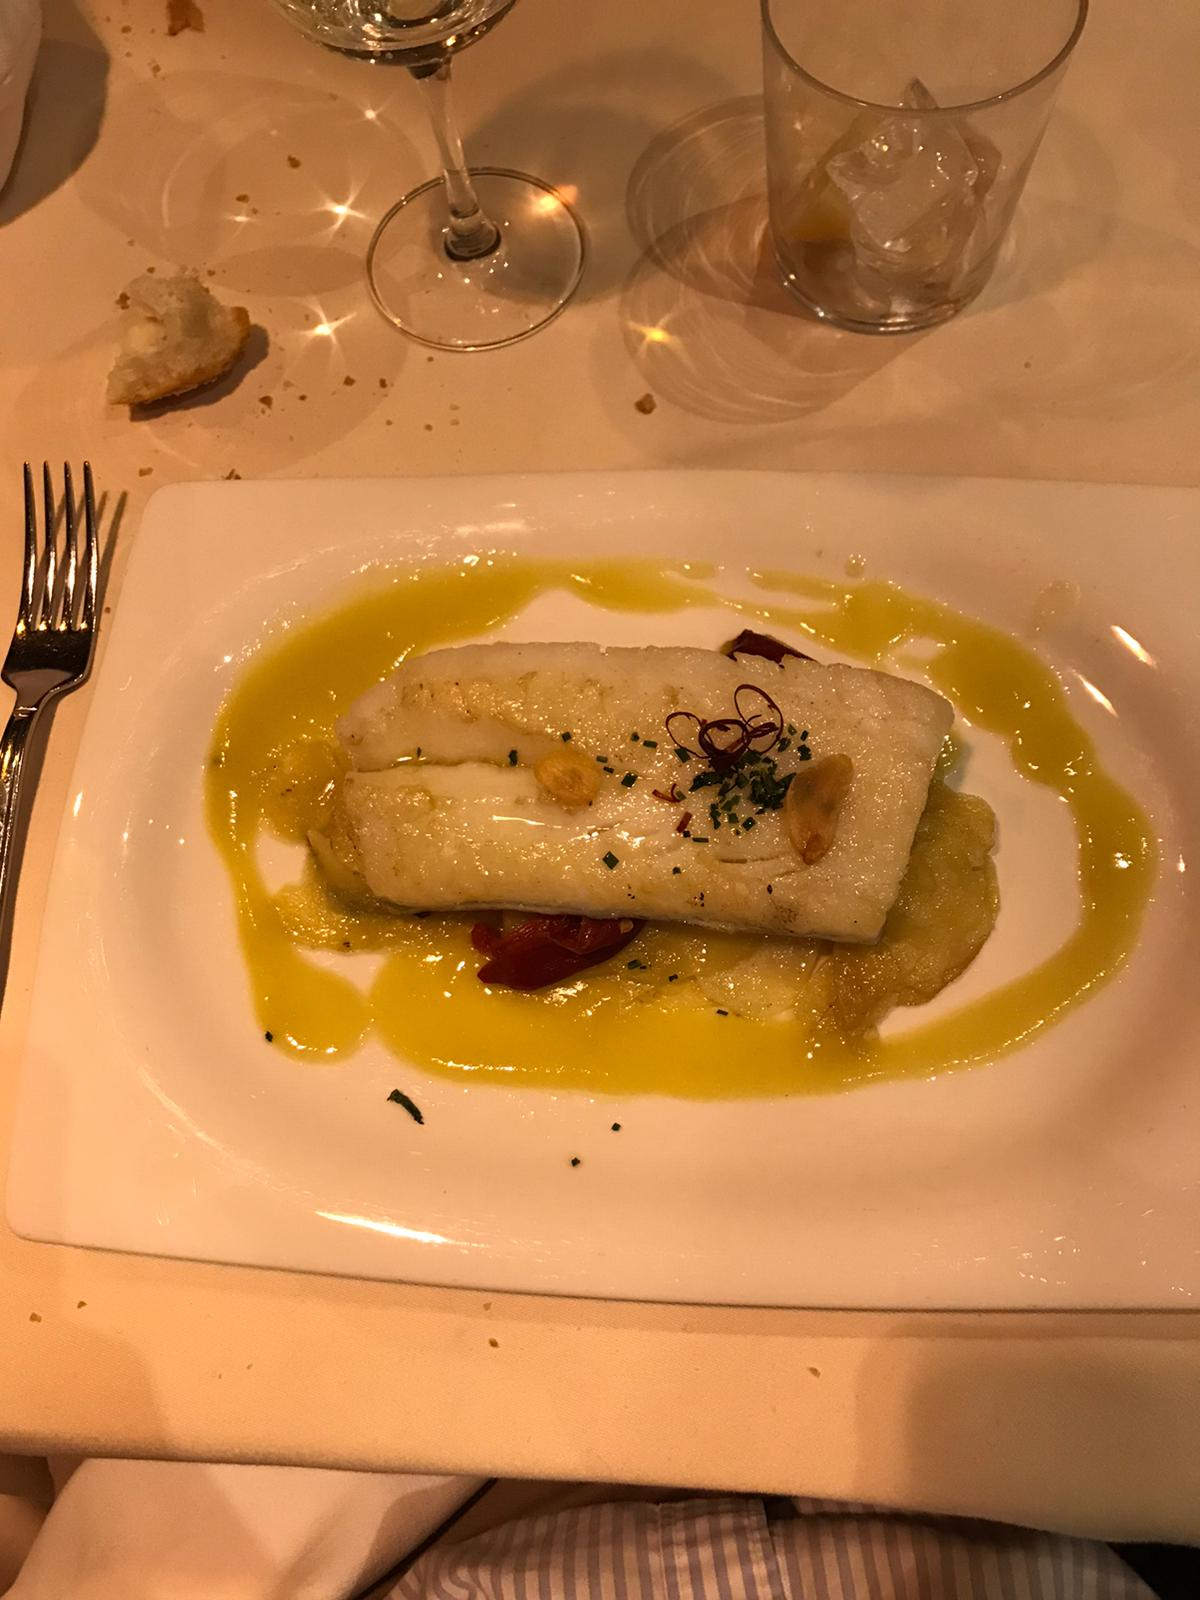 Reseña Gastronómica: Restaurante Taberna Zuria de Madrid 8